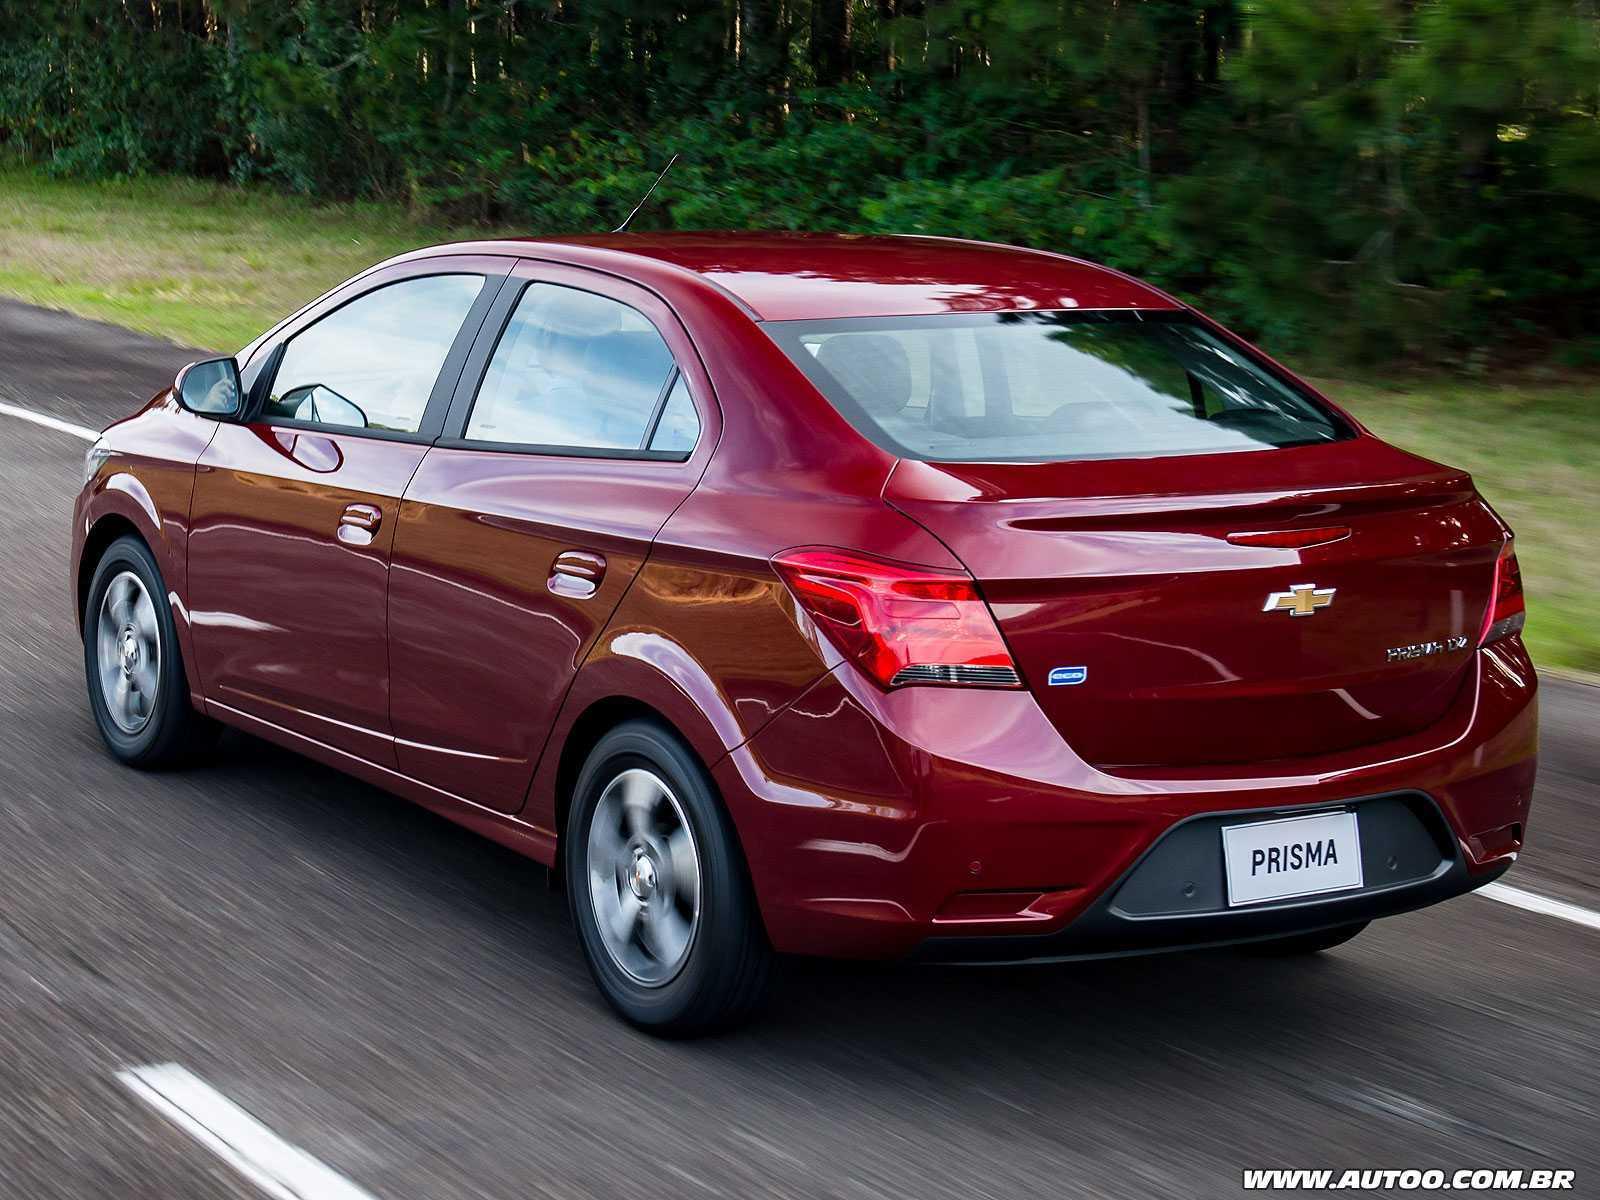 ChevroletPrisma 2017 - ângulo traseiro